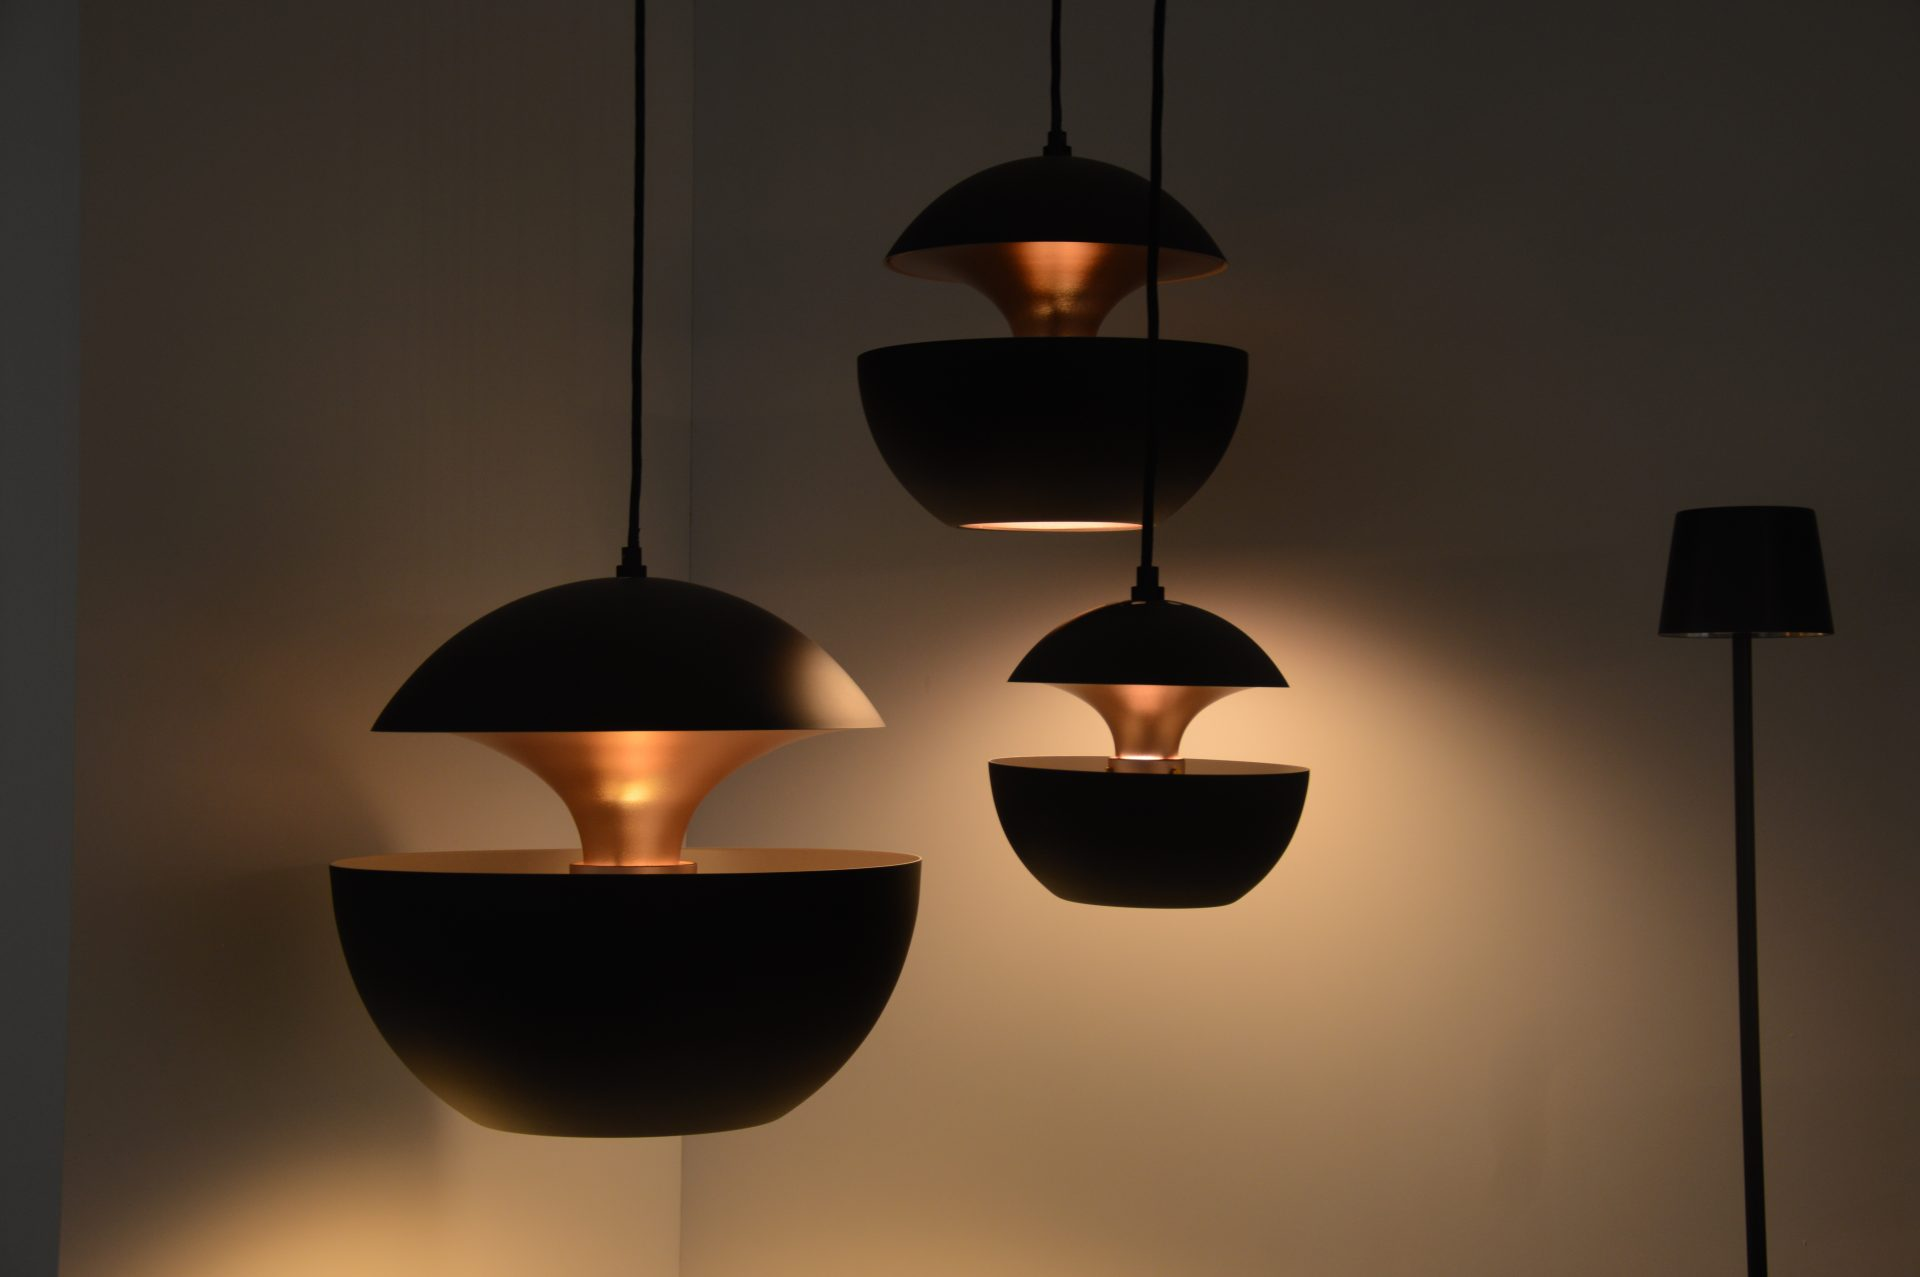 Hanglampen bogaard lichtdesign elektra for Hanglamp eettafel